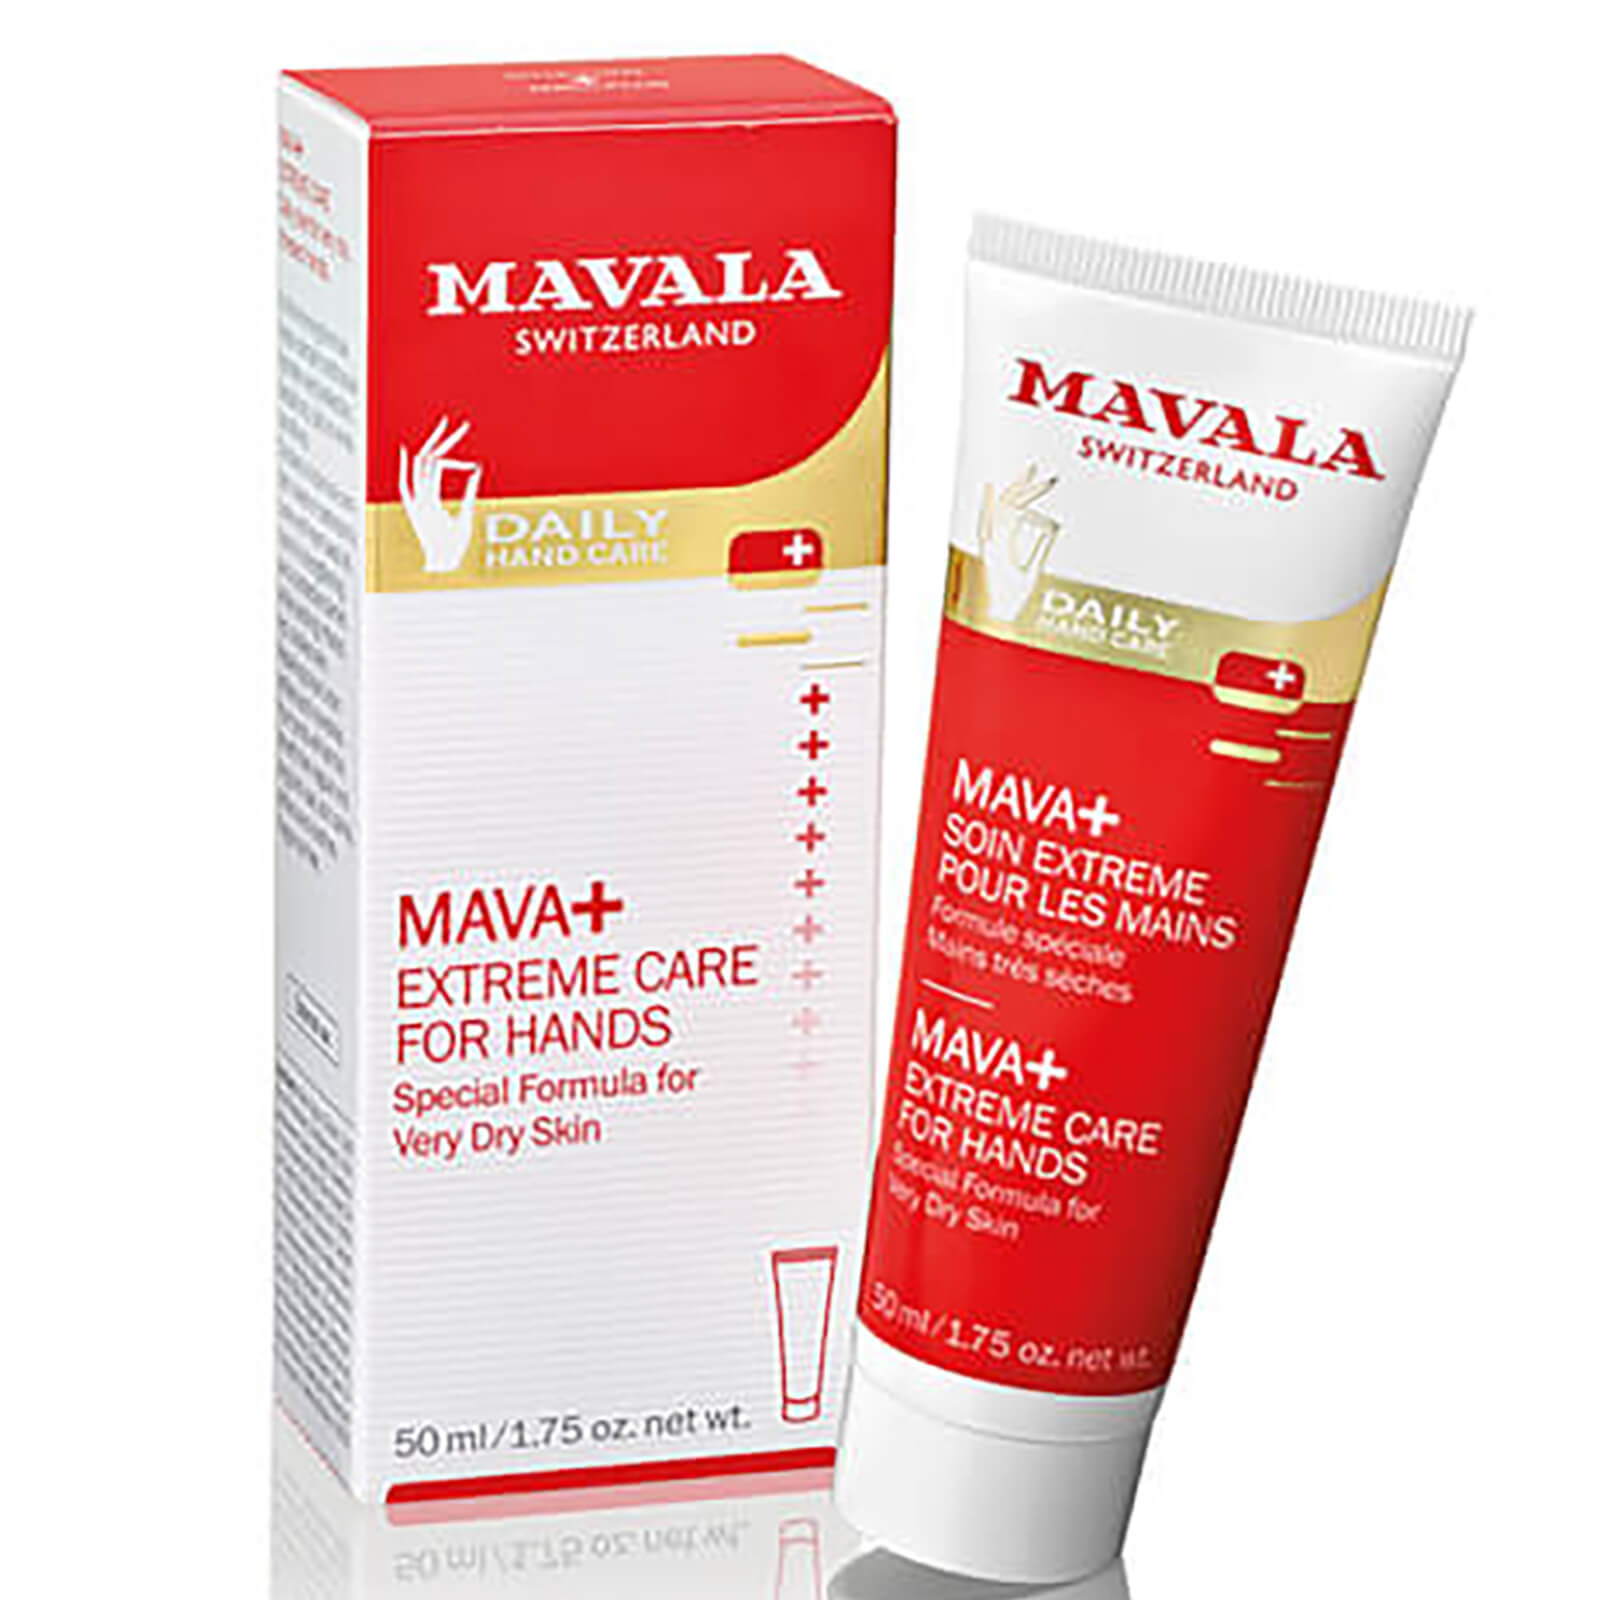 Mavala Switzerland Mava plus extreme hand care cream